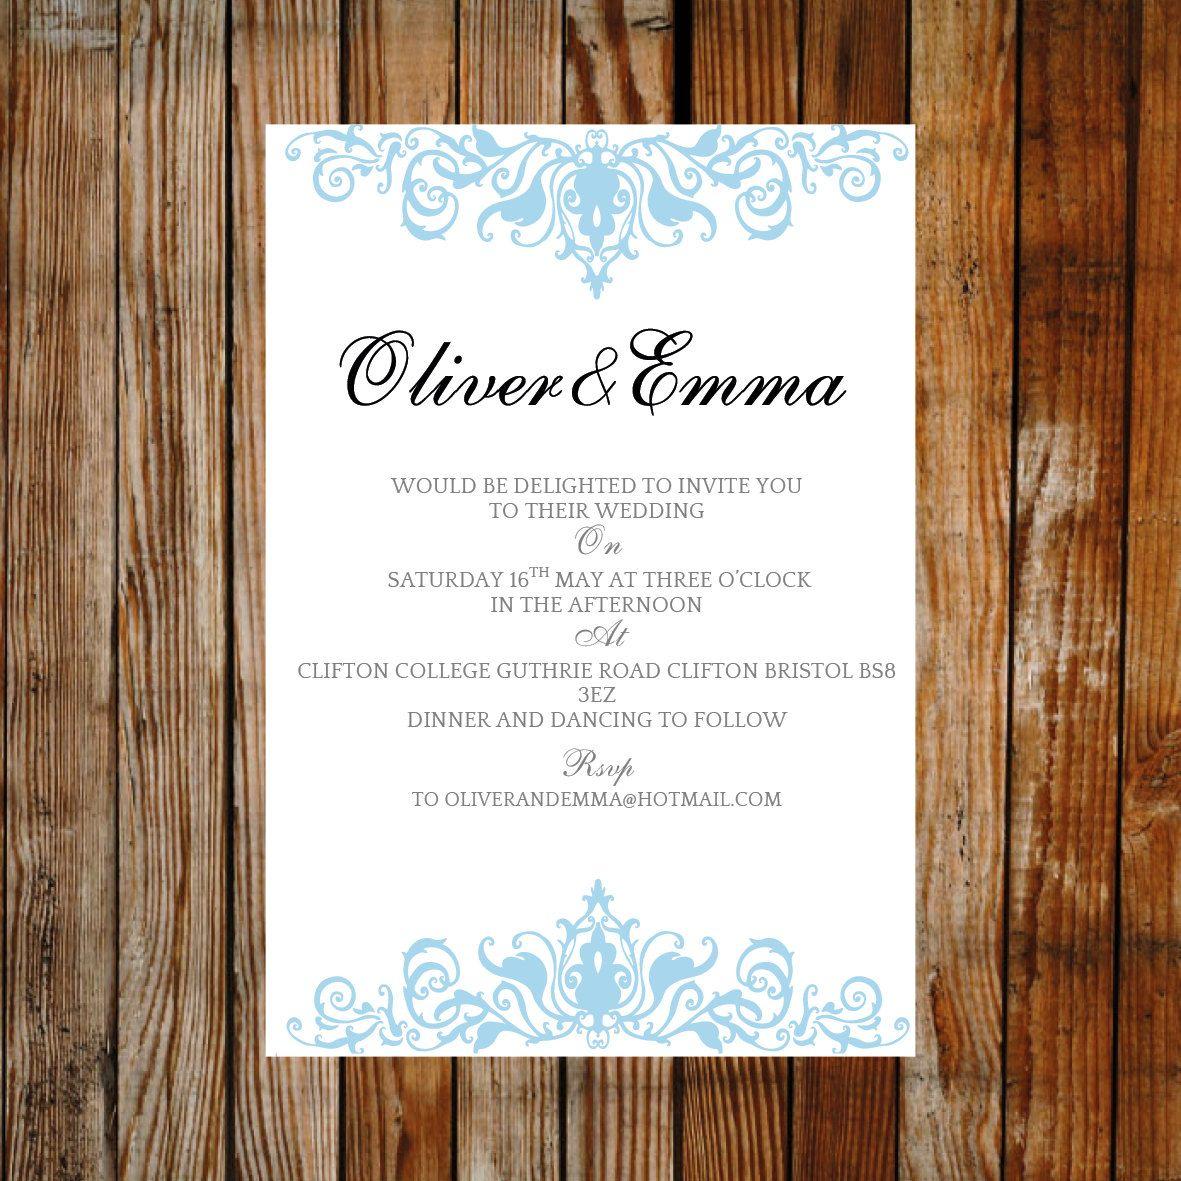 Wedding invite template elegance blue download printable wedding invite template elegance blue download printable microsoft word template diy wedding monicamarmolfo Images